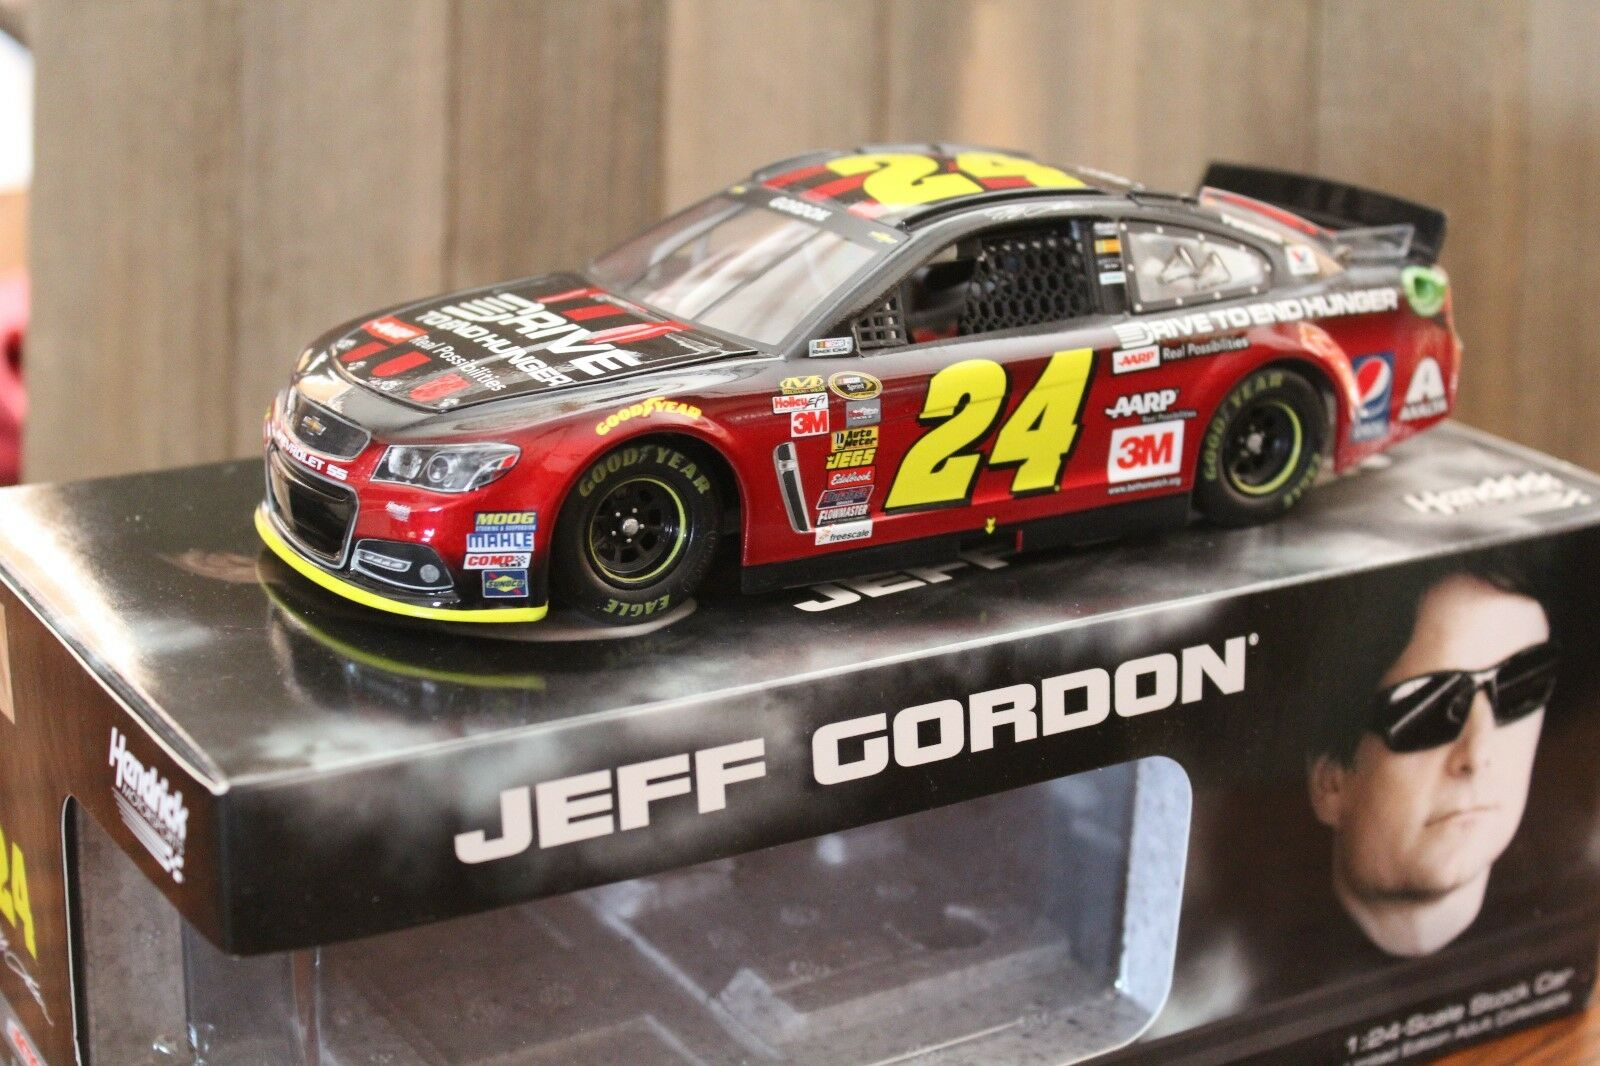 Jeff Gordon, AARP DTEH, 2015 SS, 1 24 scale car Last year racing